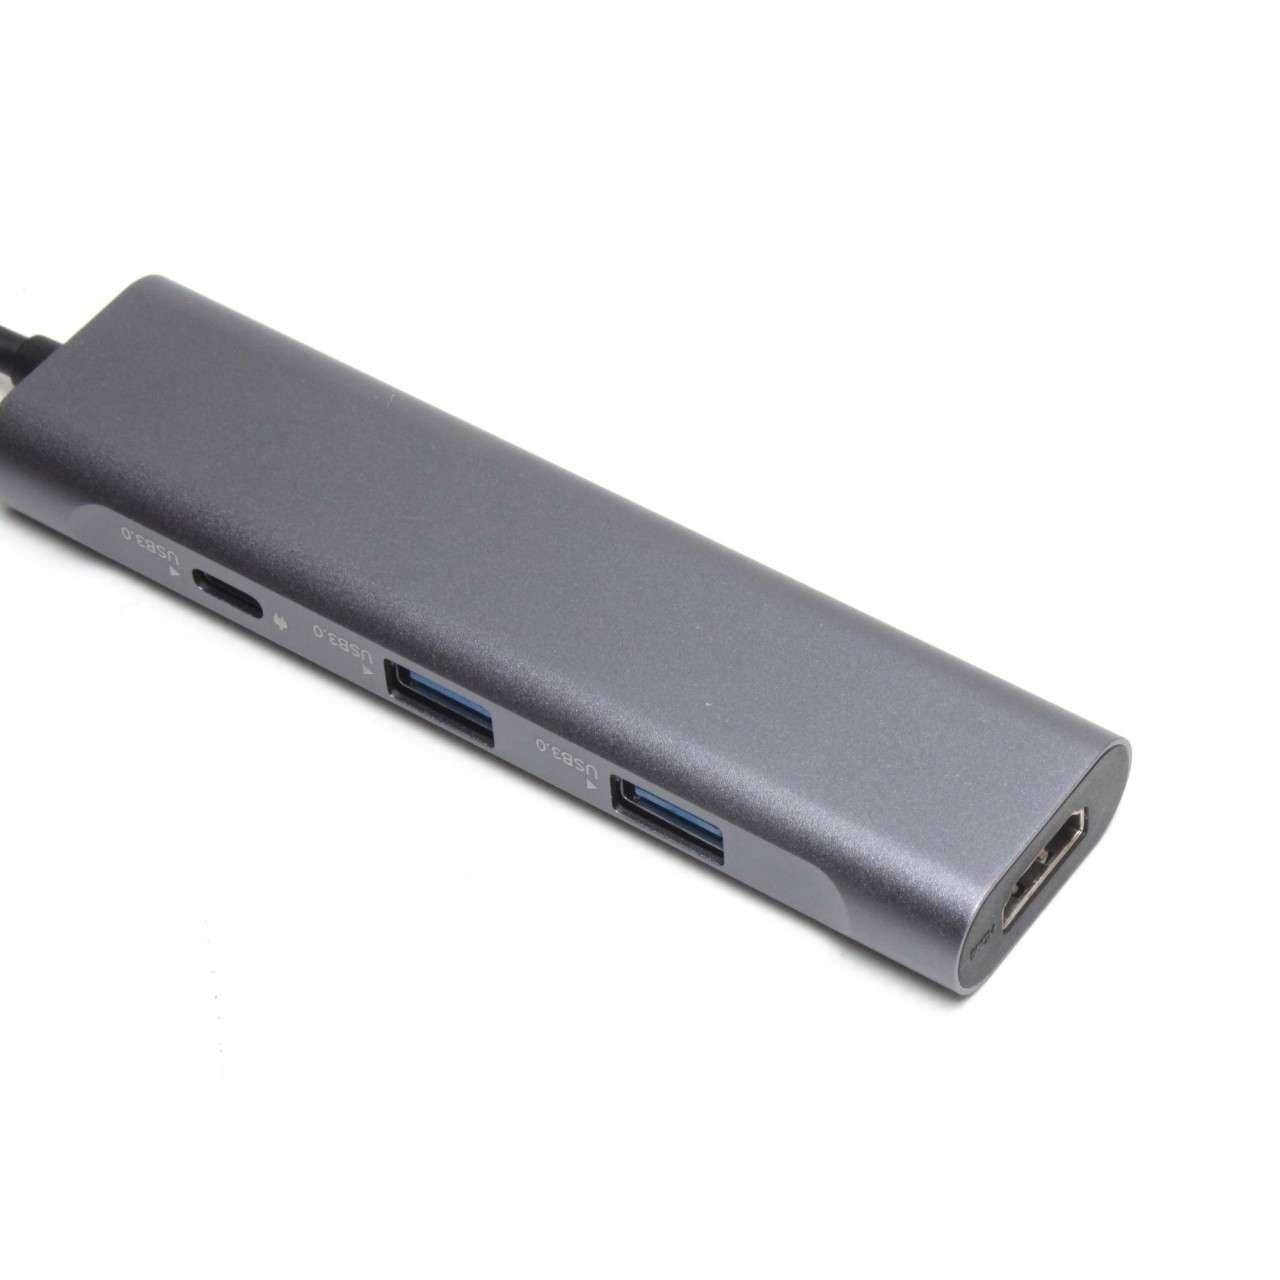 Hub USB Type C cu port HDMI 2 porturi USB 3.0 si 1 port USB-C 3.0 Aluminiu imagine powerlaptop.ro 2021